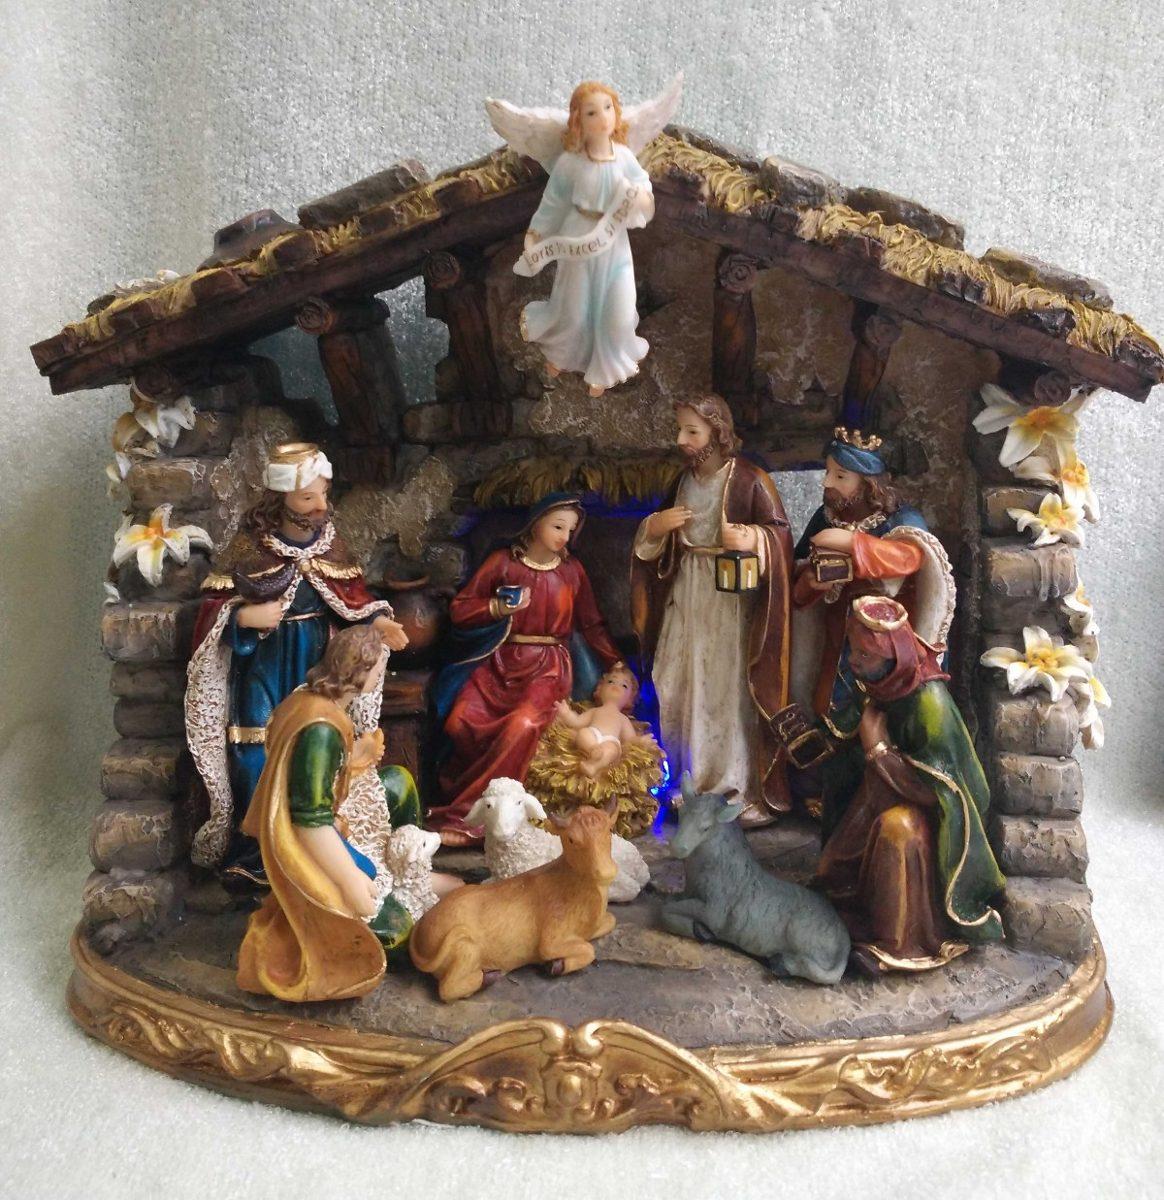 bf0230b3b35 Nacimiento Pesebre Navidad 22cm 529-32226 Religiozzi -   233.100 en ...